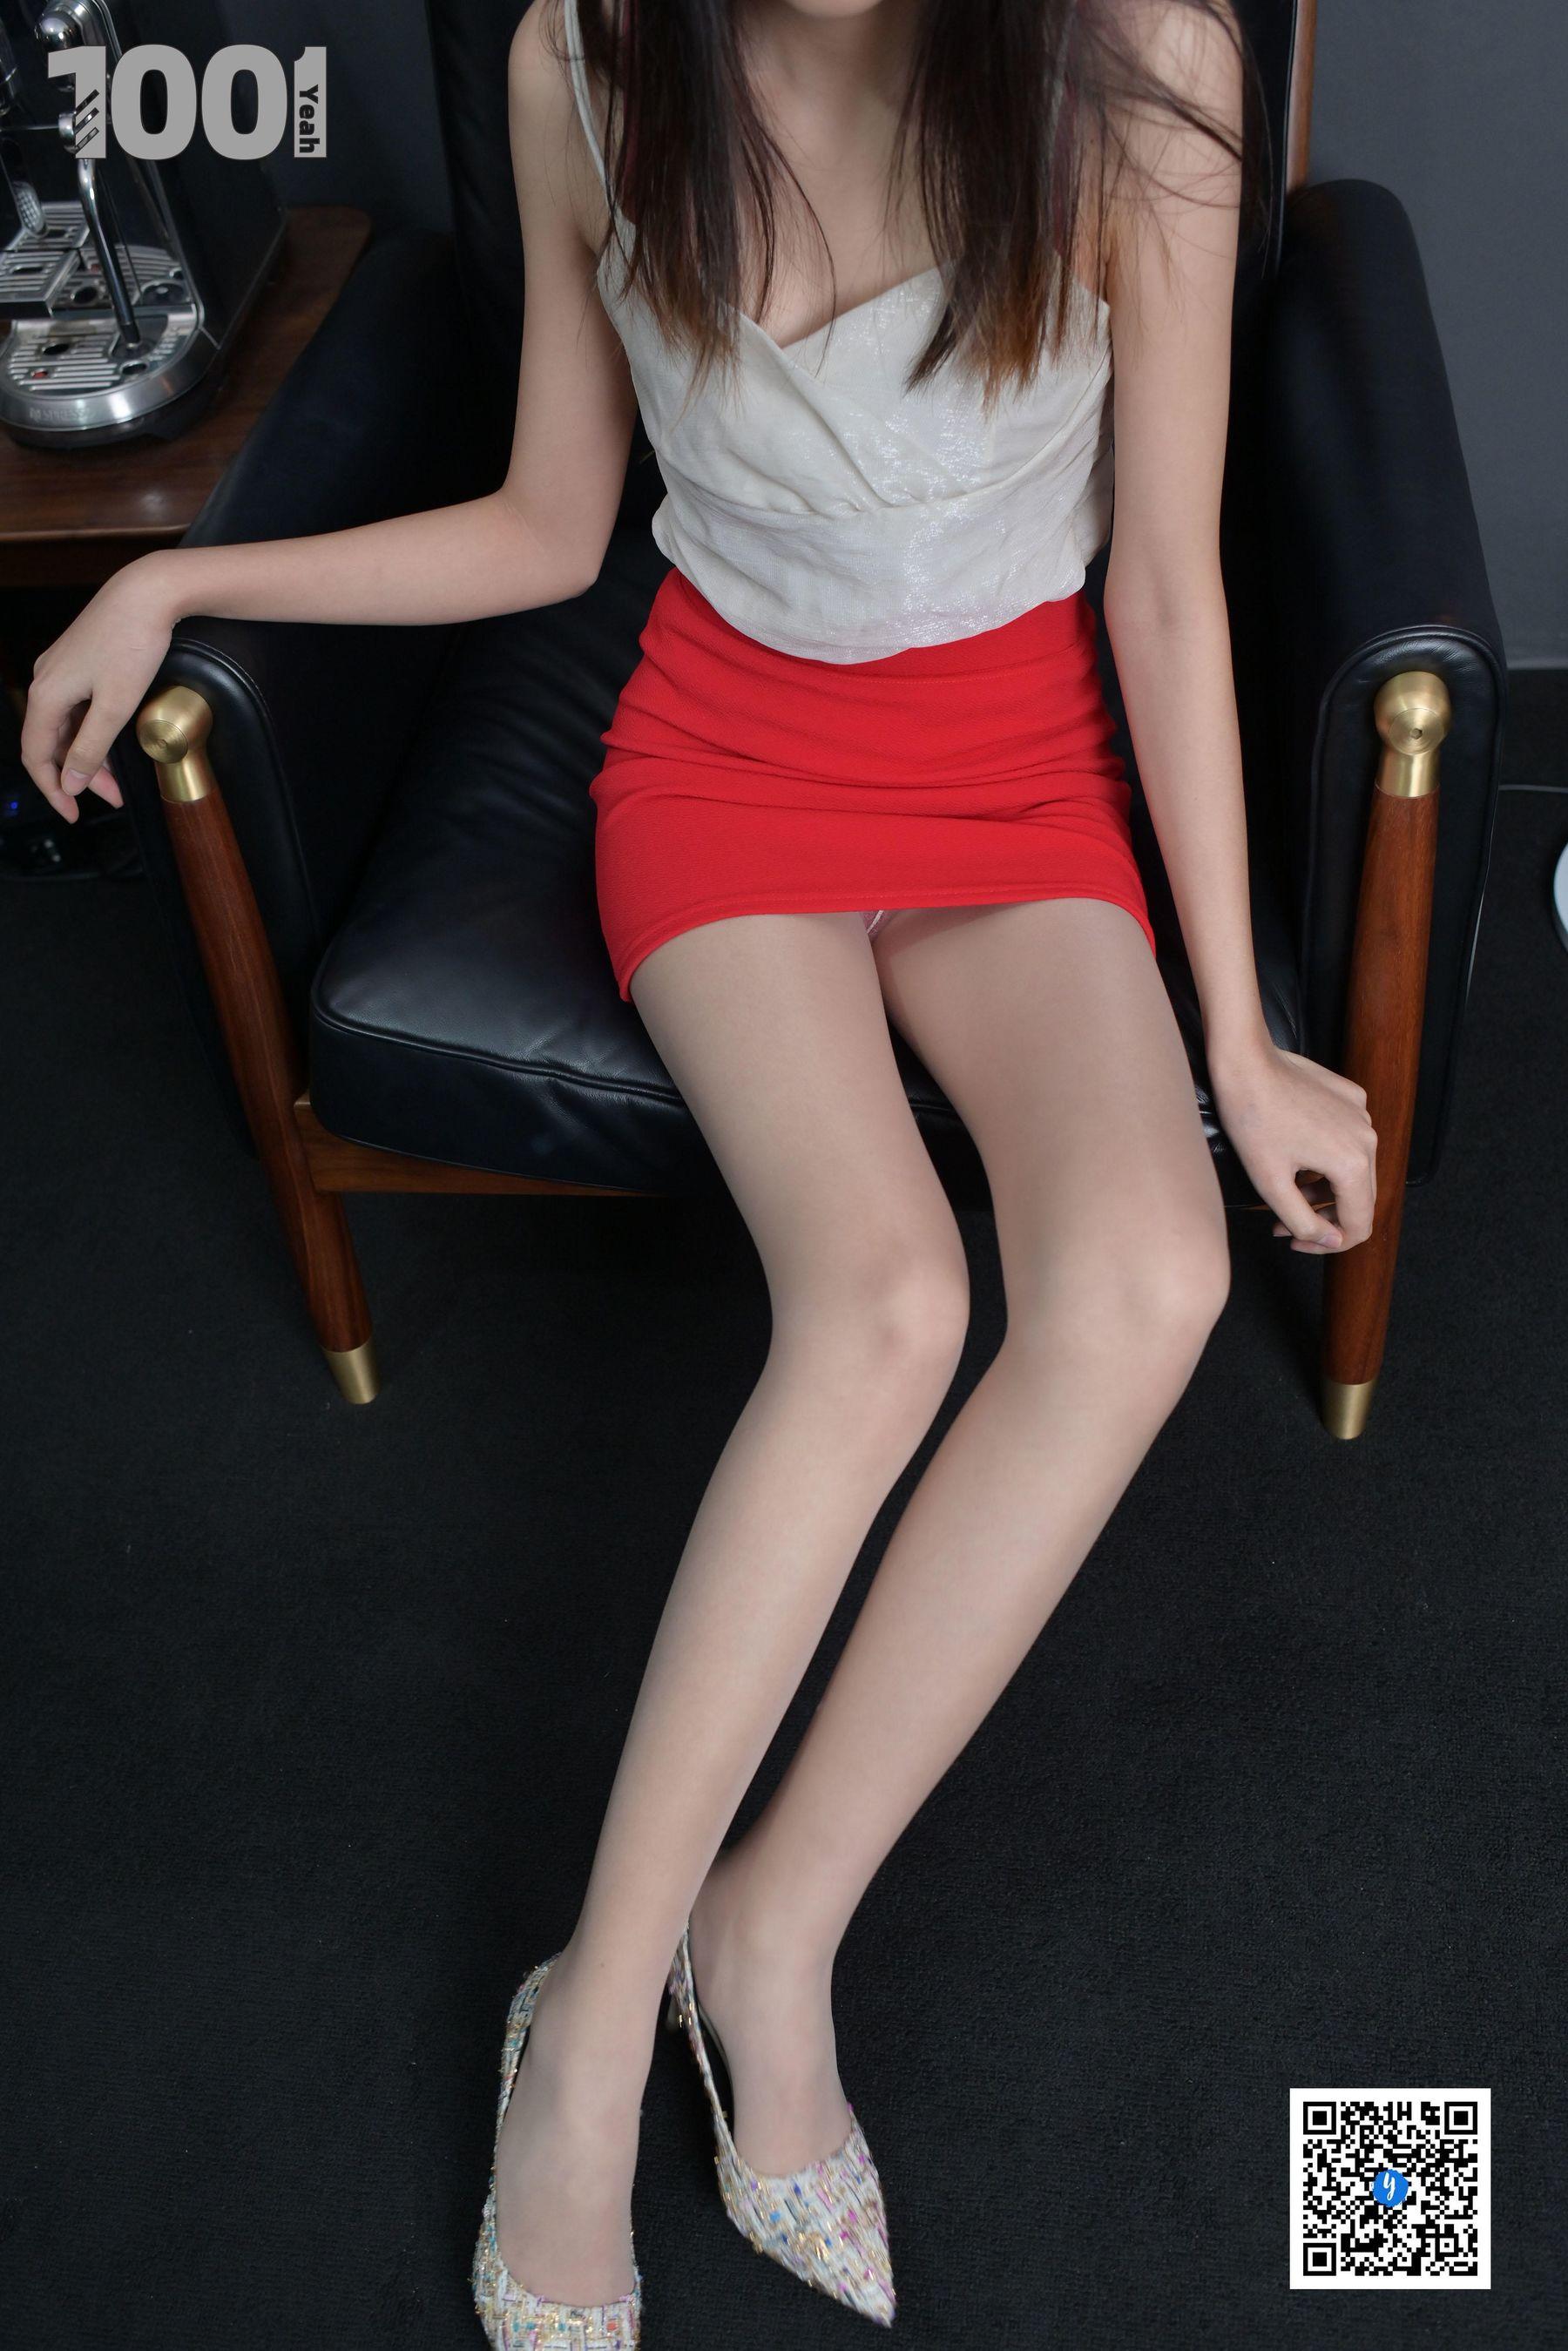 VOL.961 [异思趣向]肉丝美腿:匿名超高清写真套图(87P)